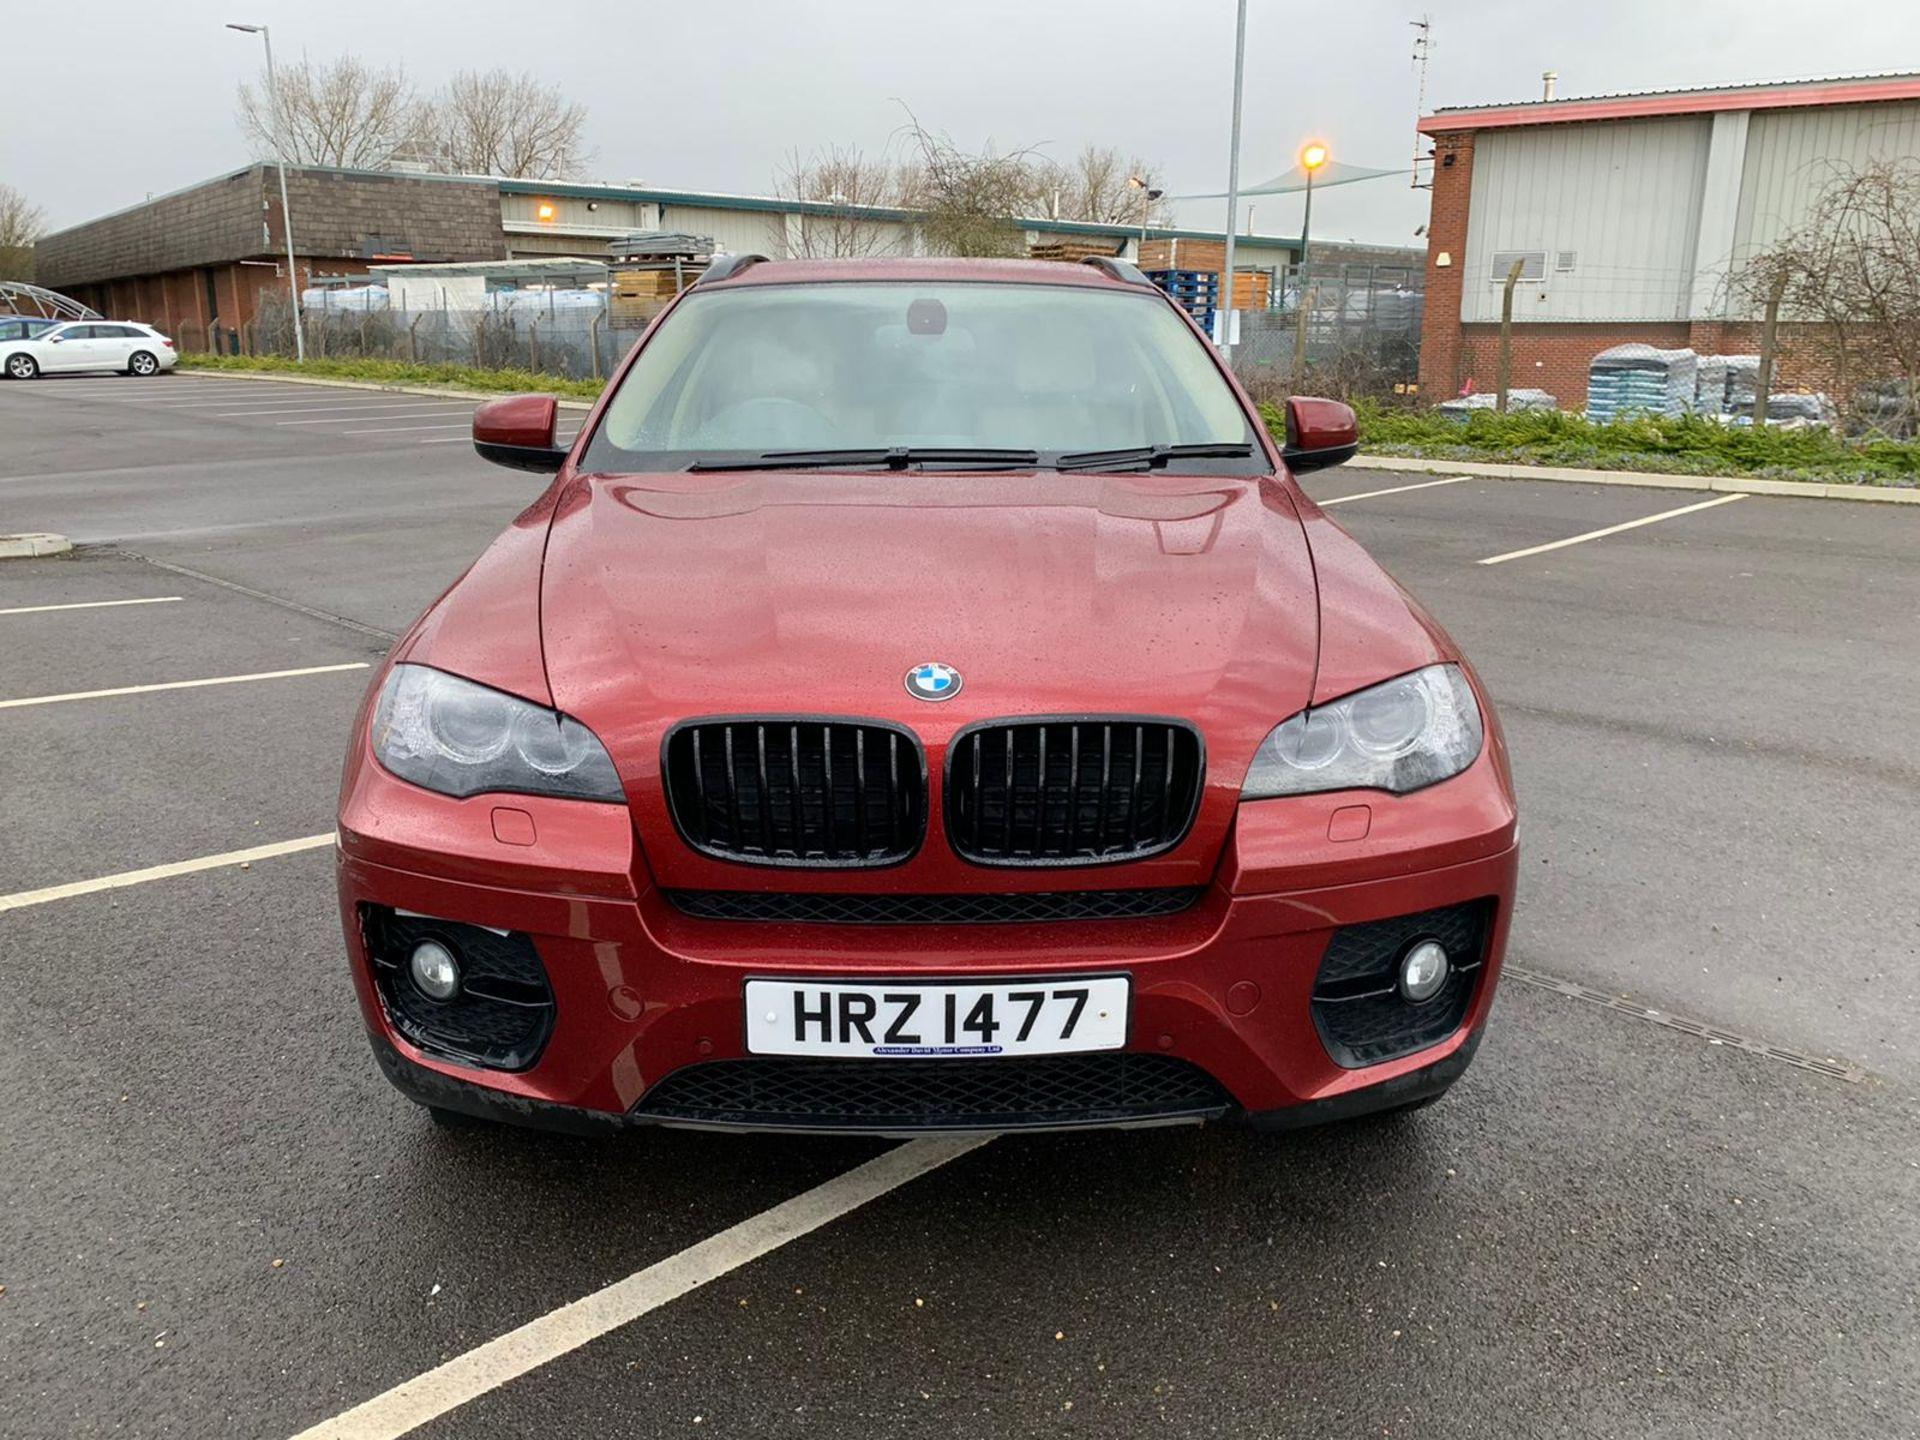 Reseve Met - BMW X6 xDrive 3.0d Auto - 2014 Reg - Leather Interior -Parking Sensors - Reversing Cam - Image 6 of 30